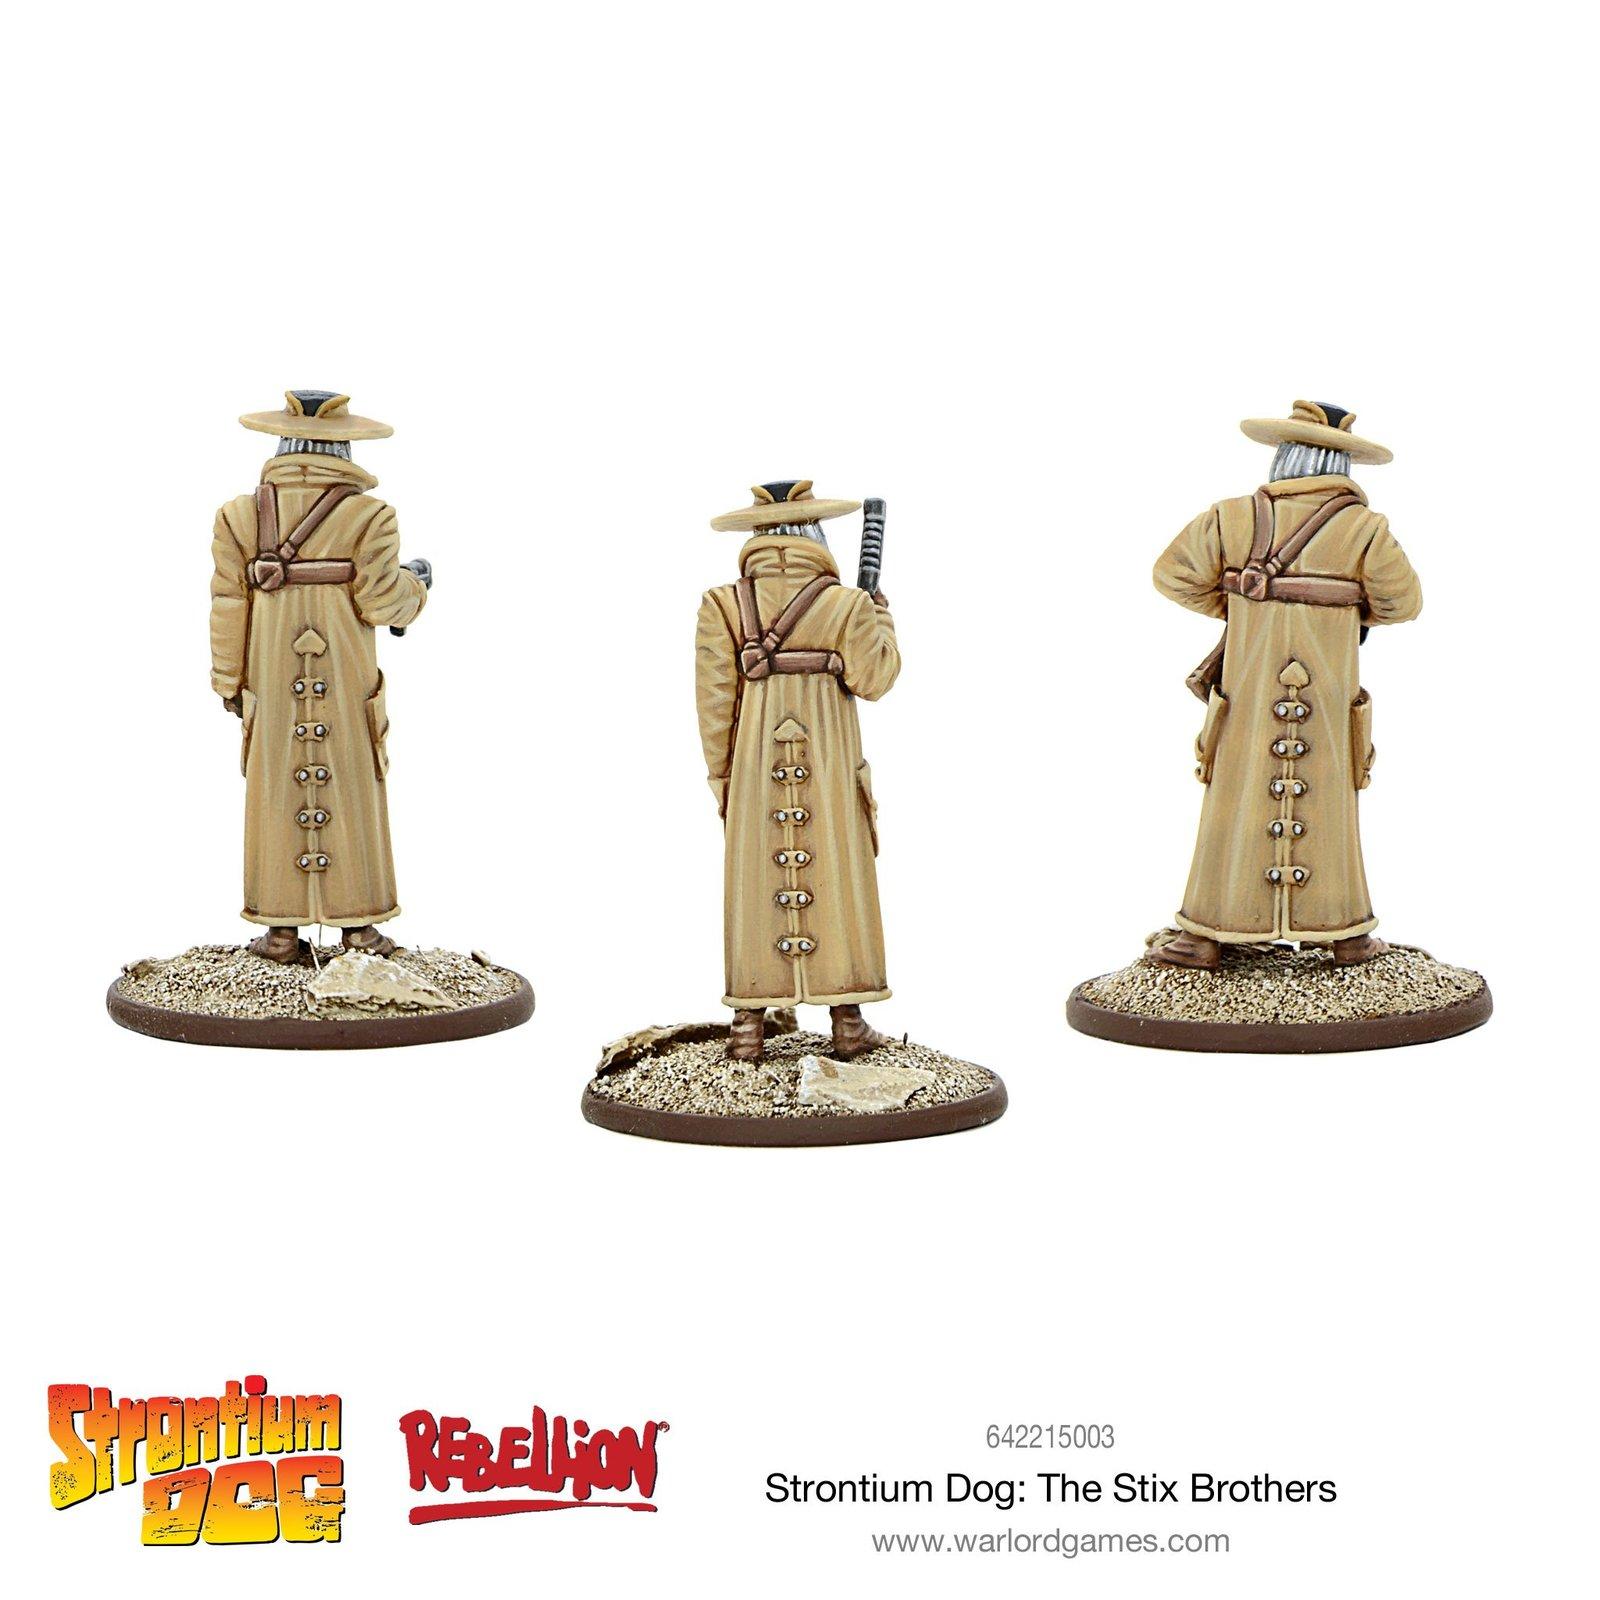 Strontium Dog: The Stix Brothers image